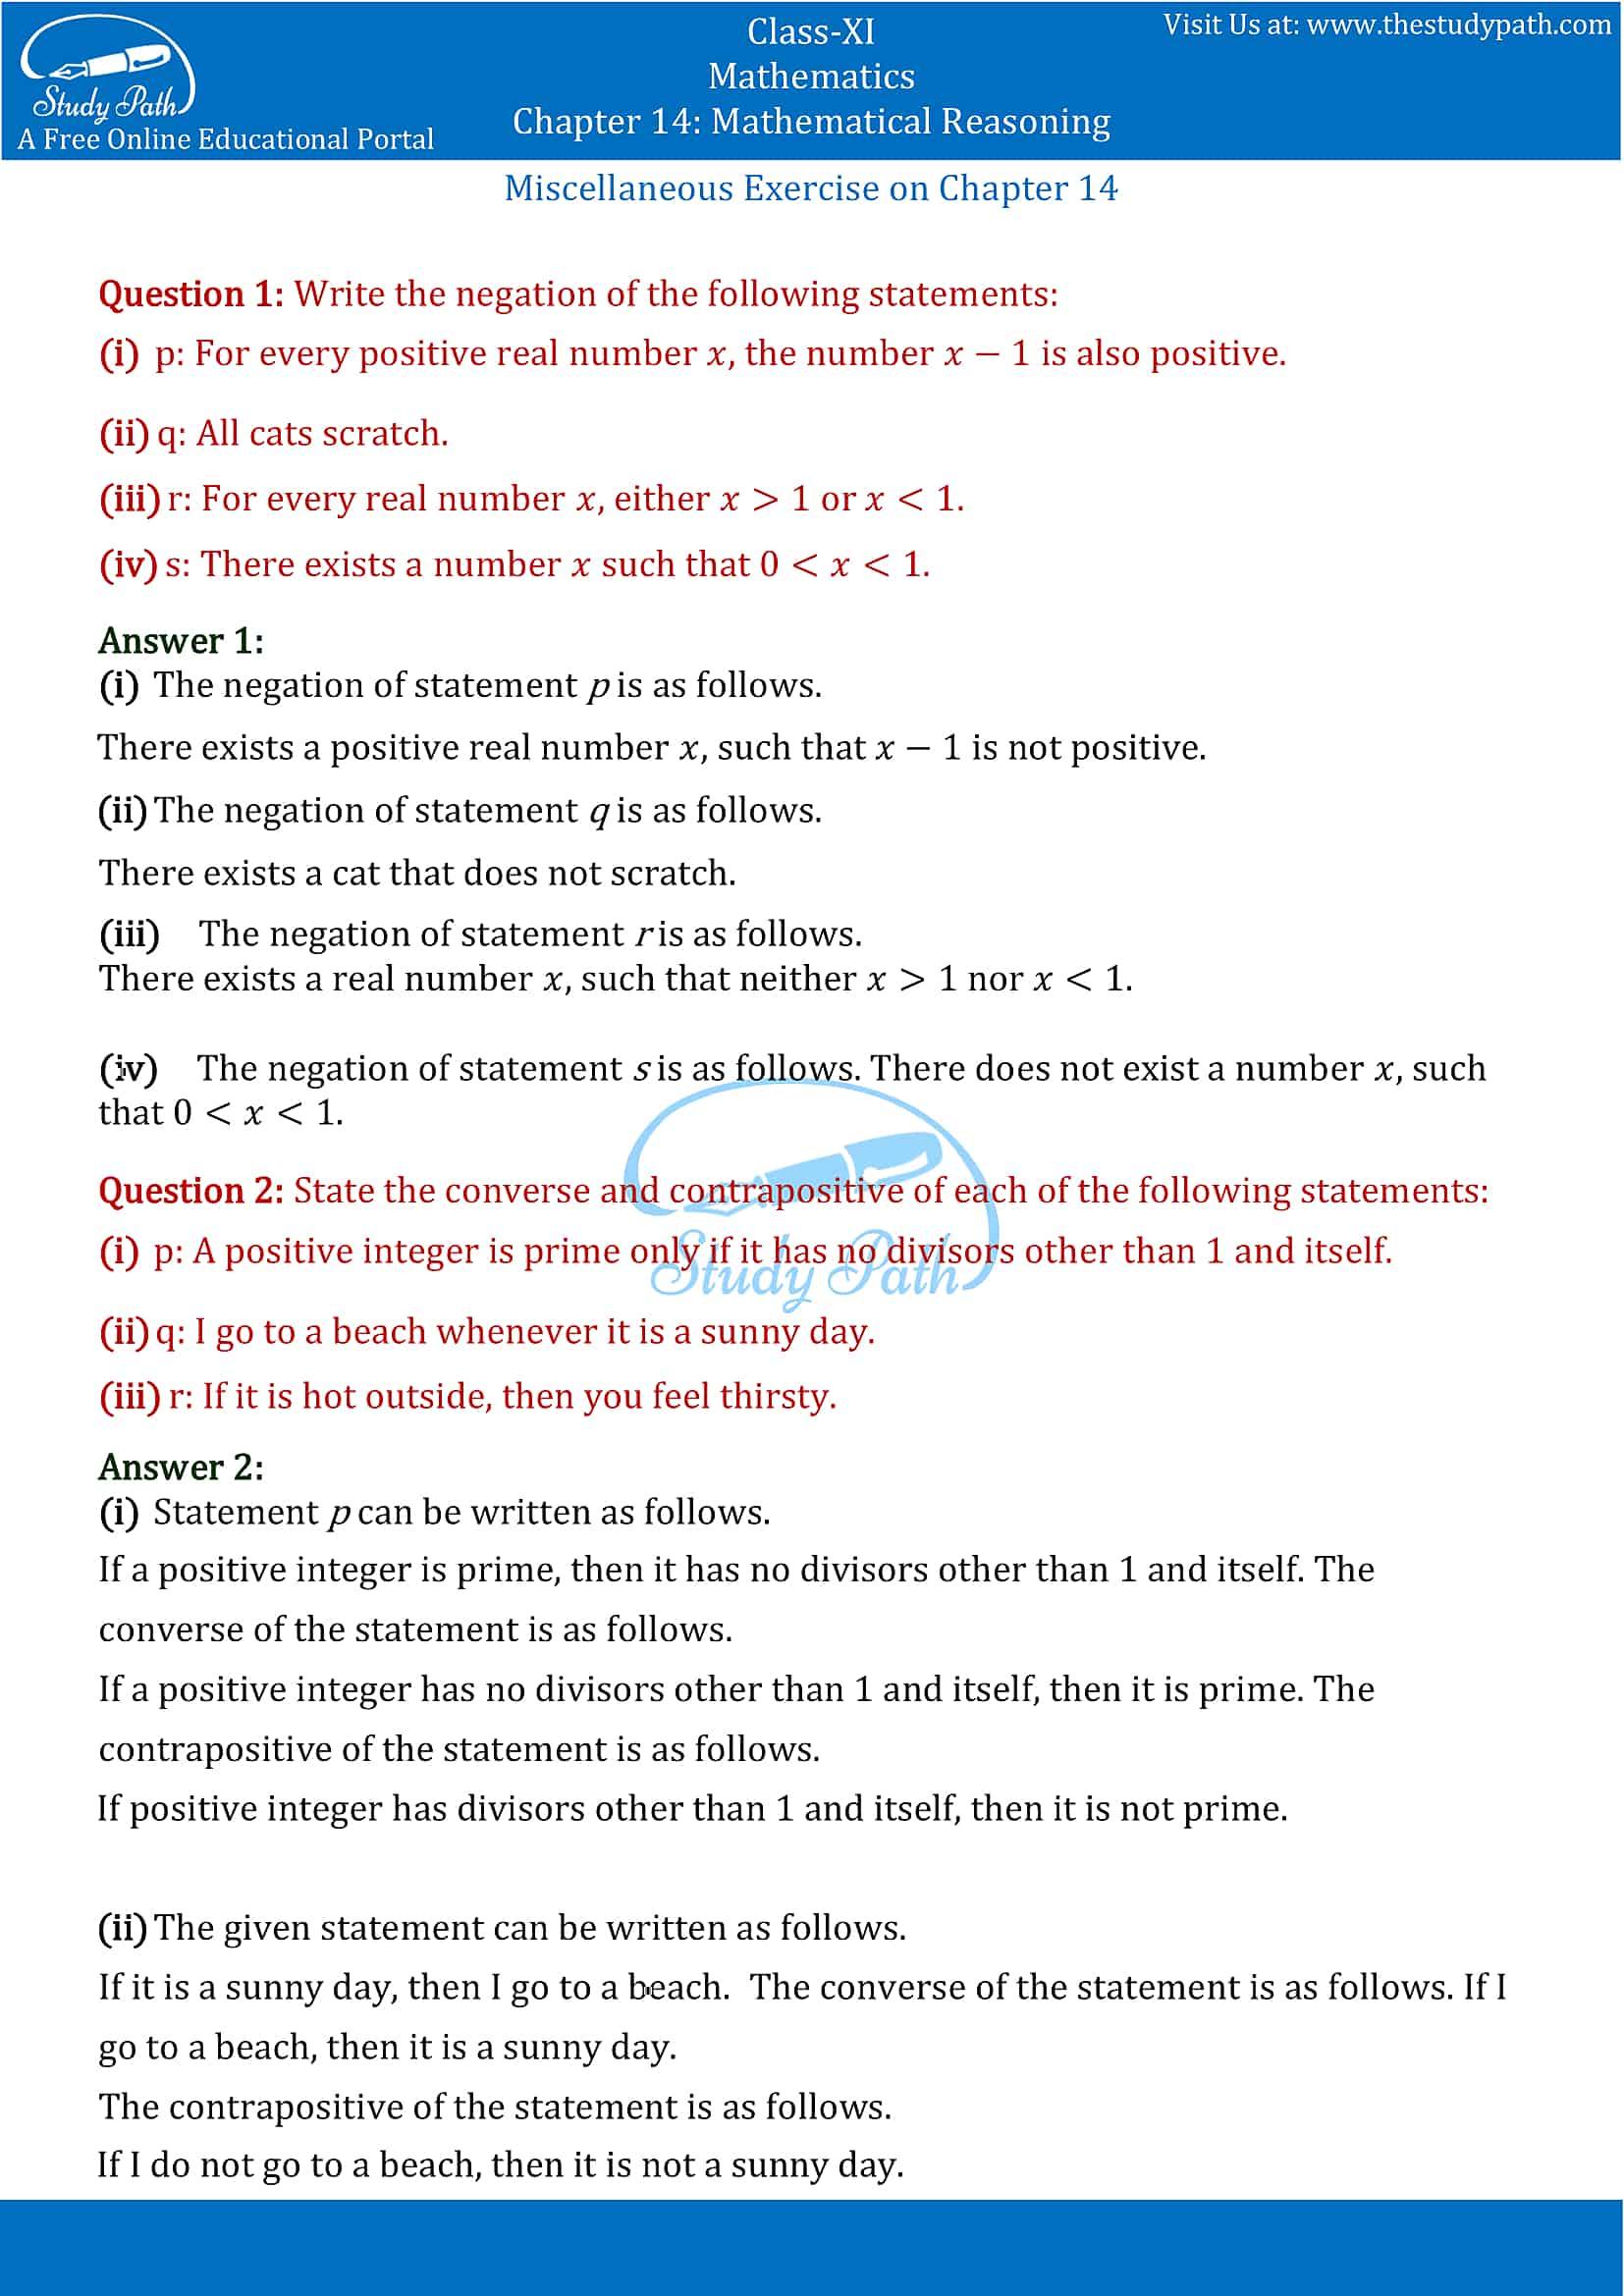 NCERT Solutions for Class 11 Maths Chapter 14 Mathematical Reasoning Part 13